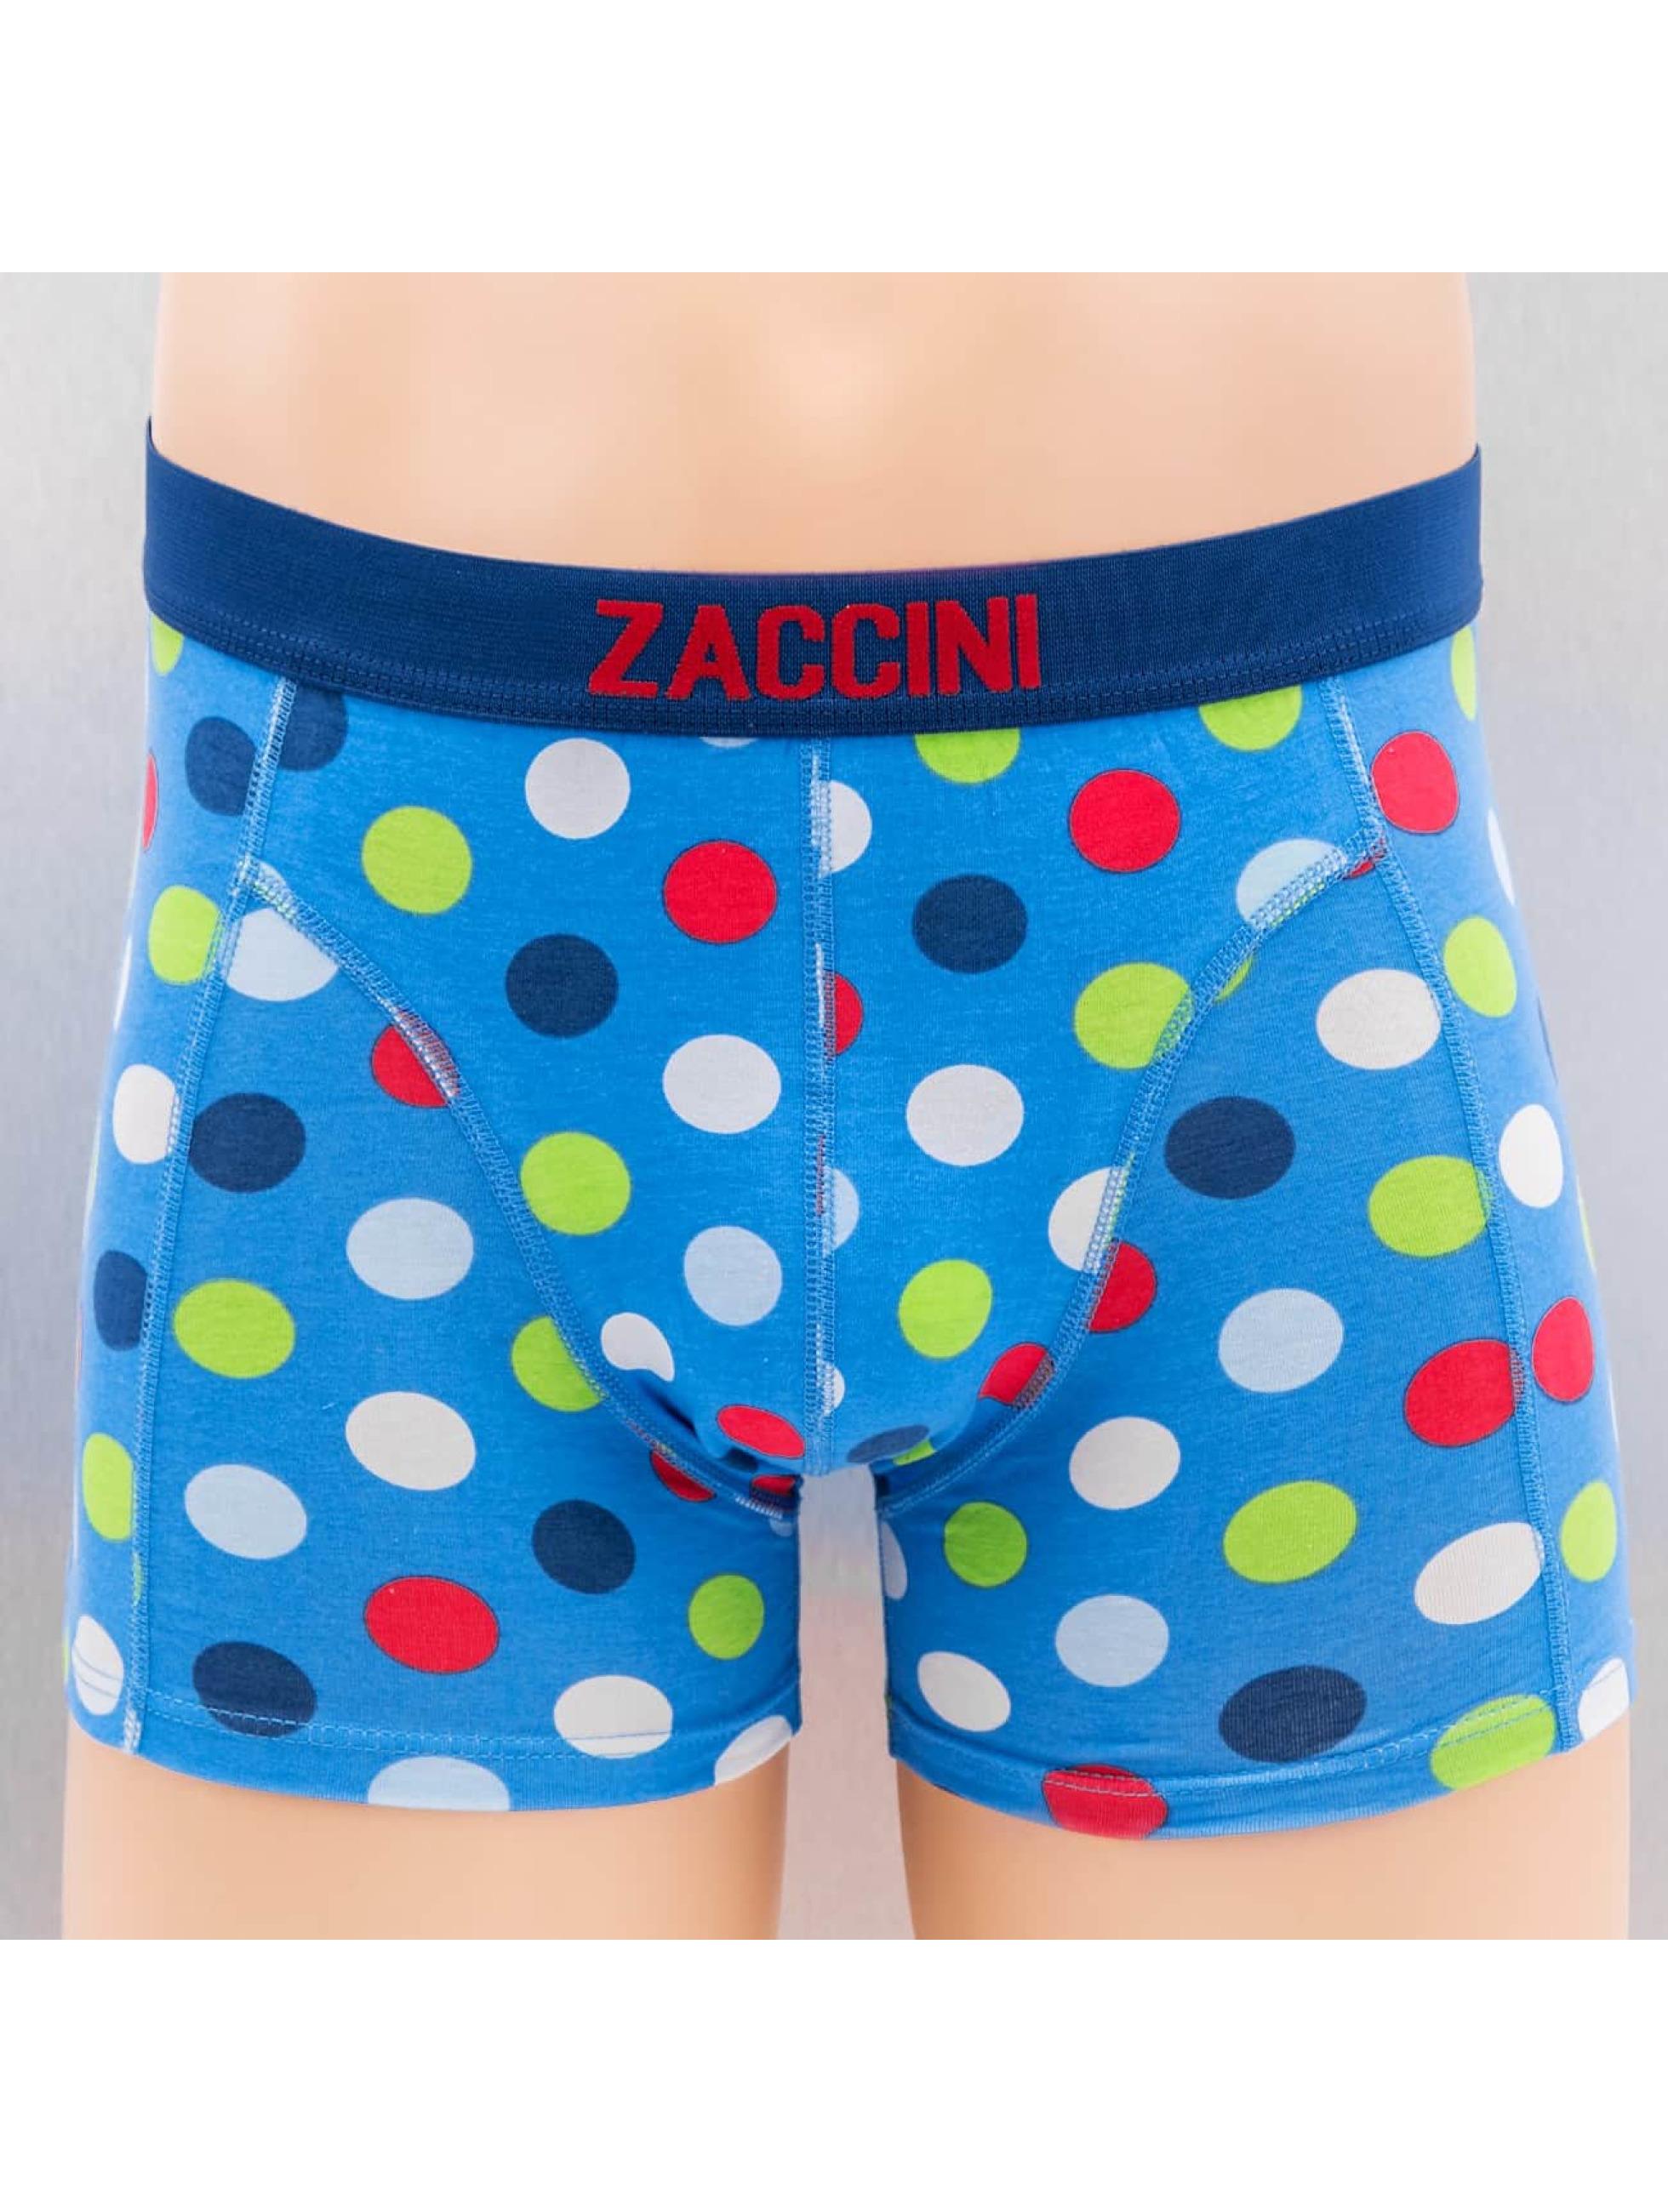 Zaccini Семейные трусы Confetti 2-Pack синий